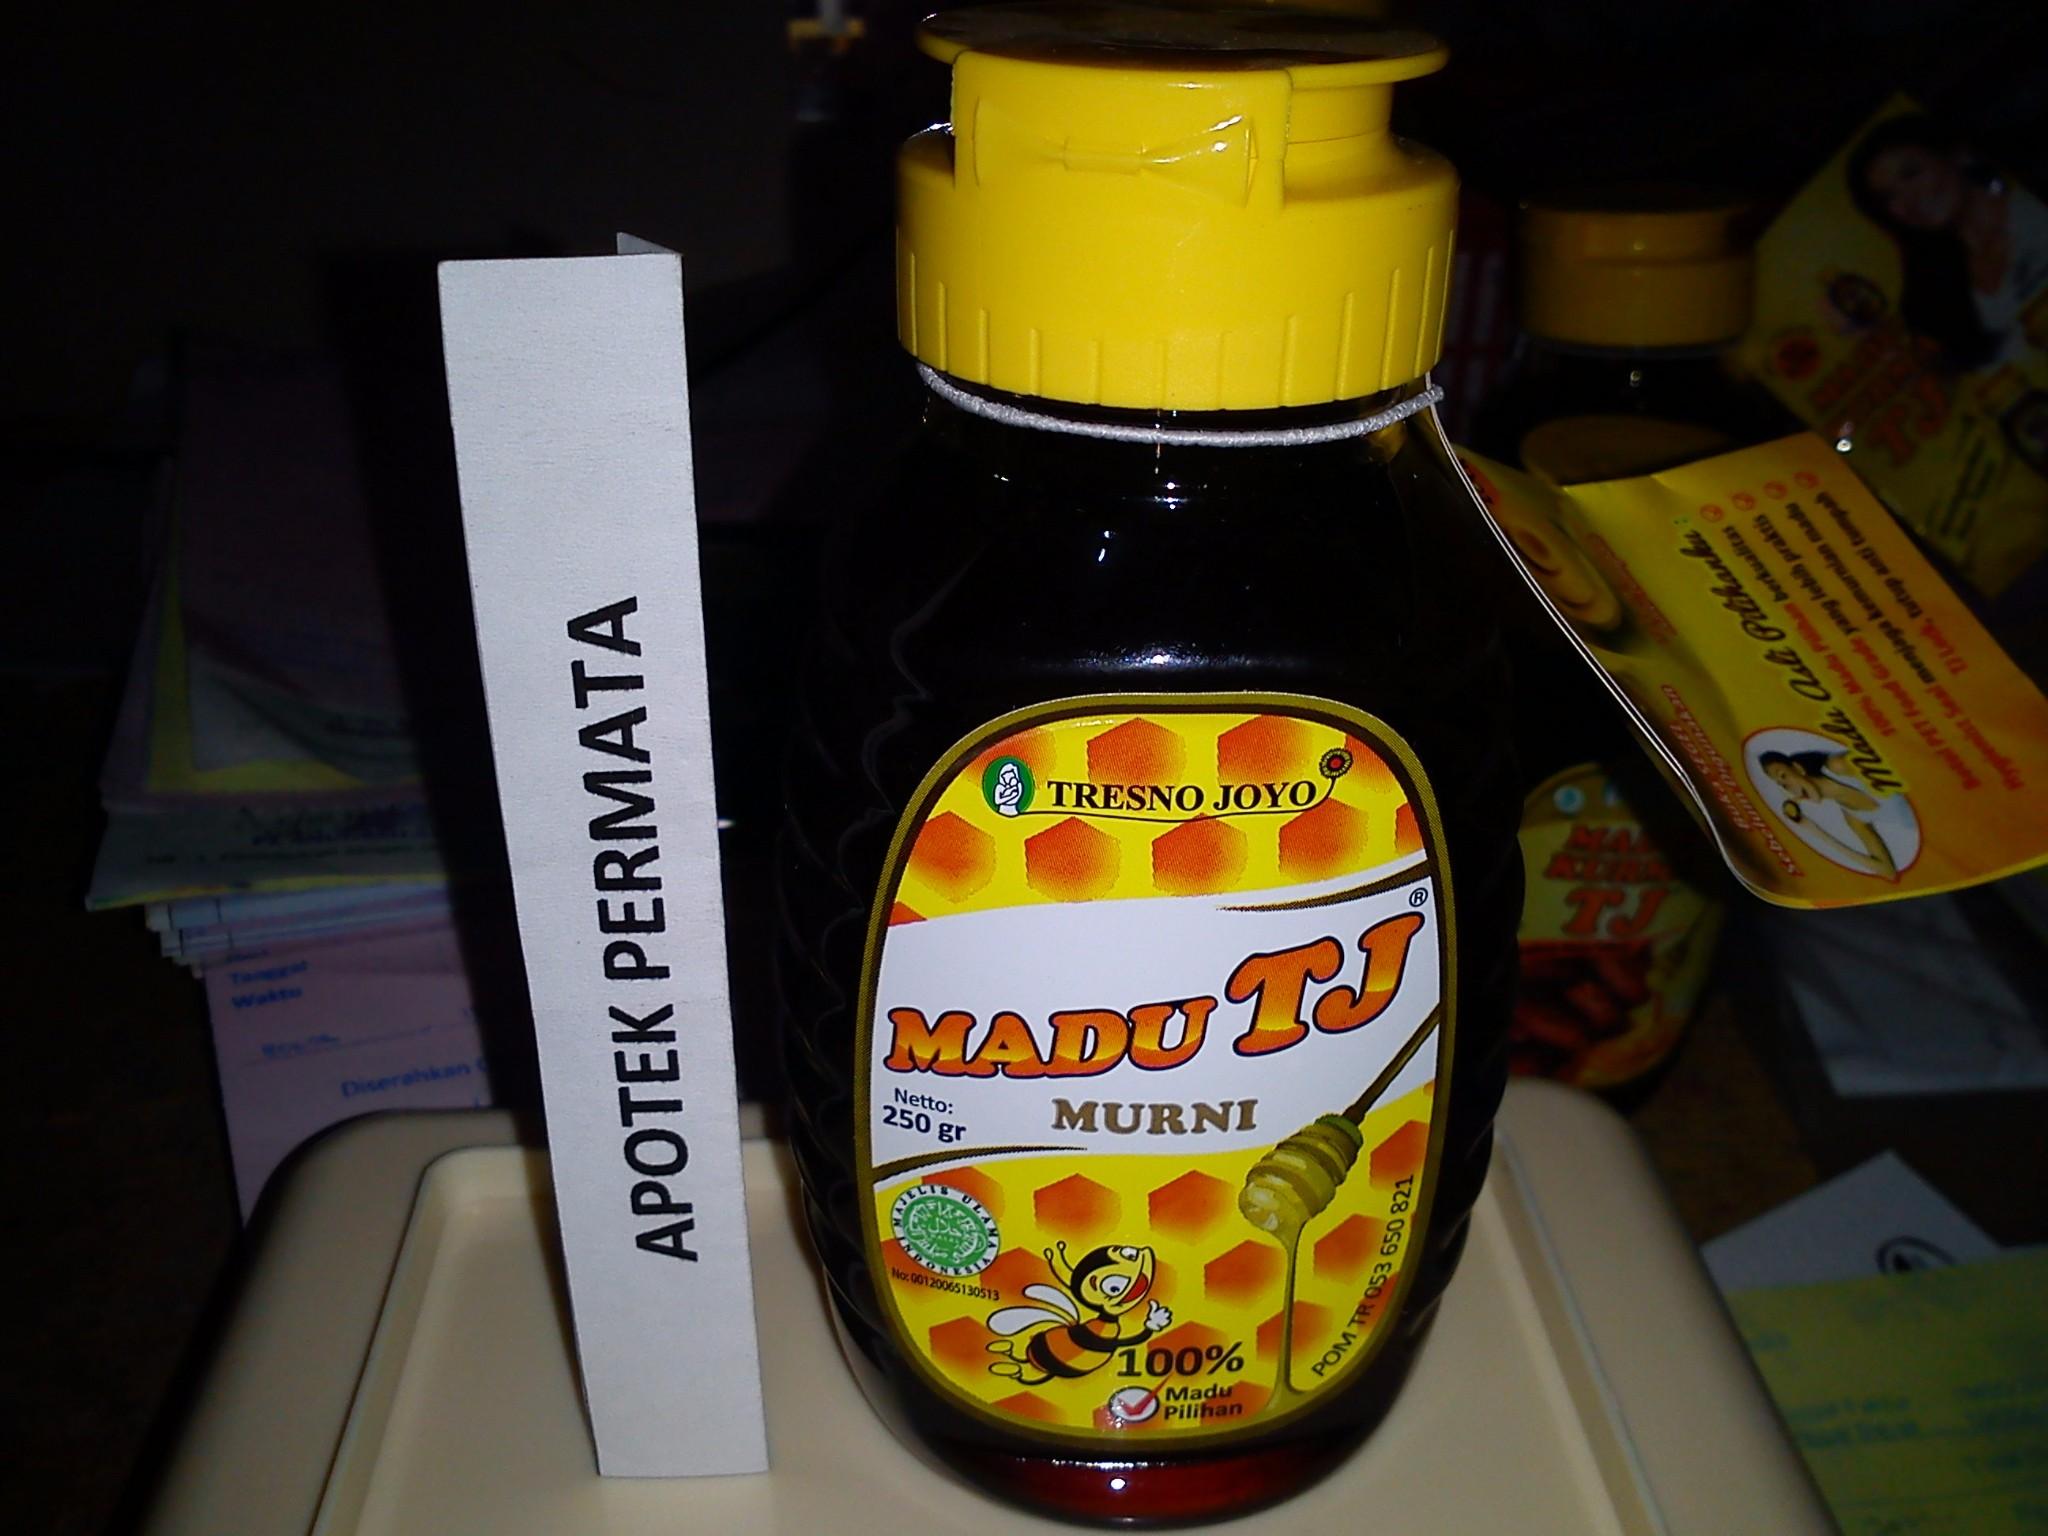 Madu Tj Kurma 250 Gr 2 Botol Daftar Harga Terkini Dan Terlengkap Joybee Anak 100ml Murni